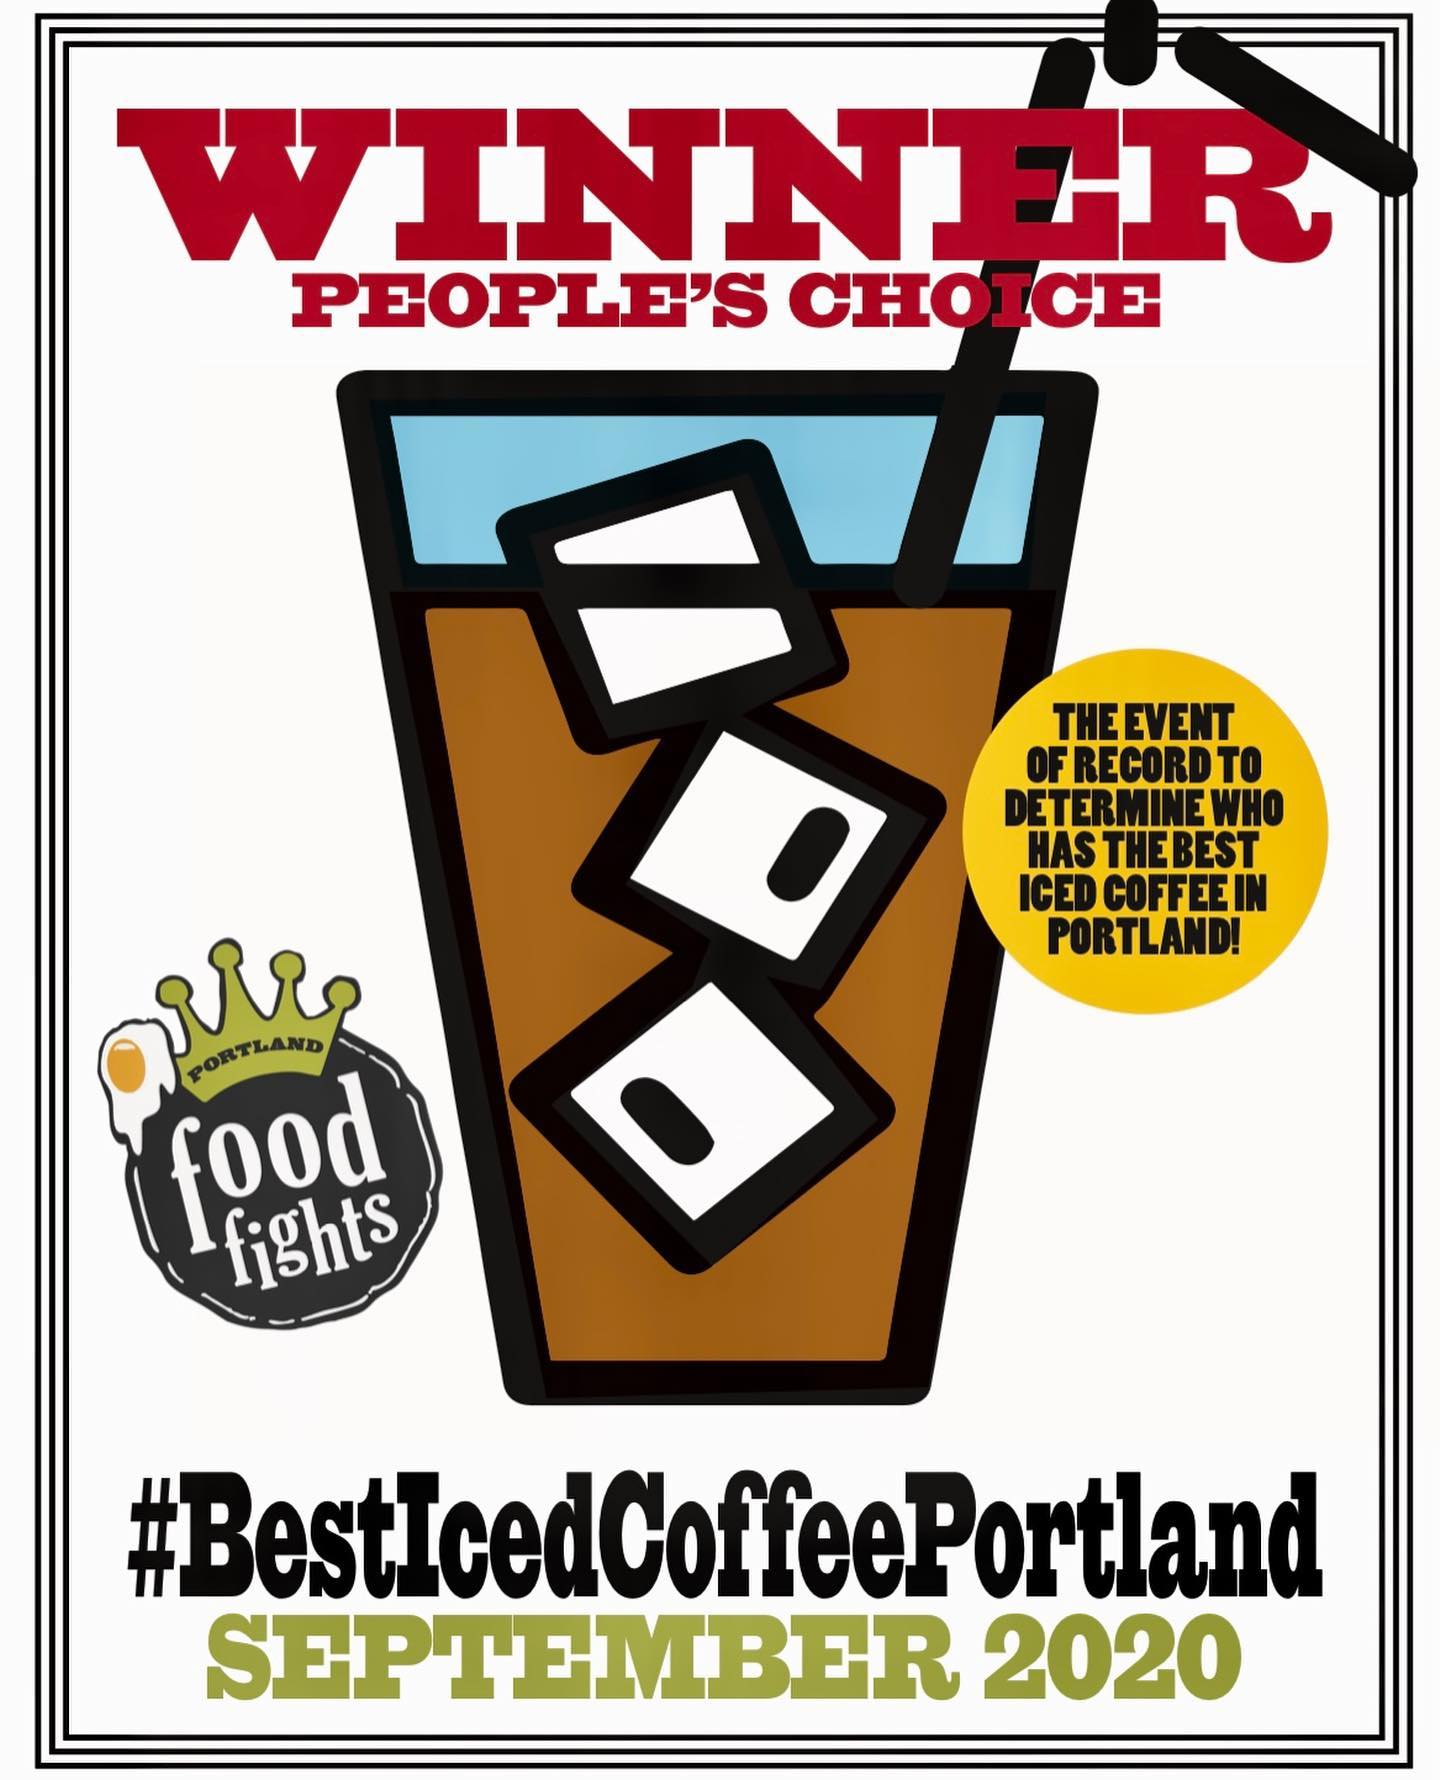 Best Iced Coffee Portland 2020